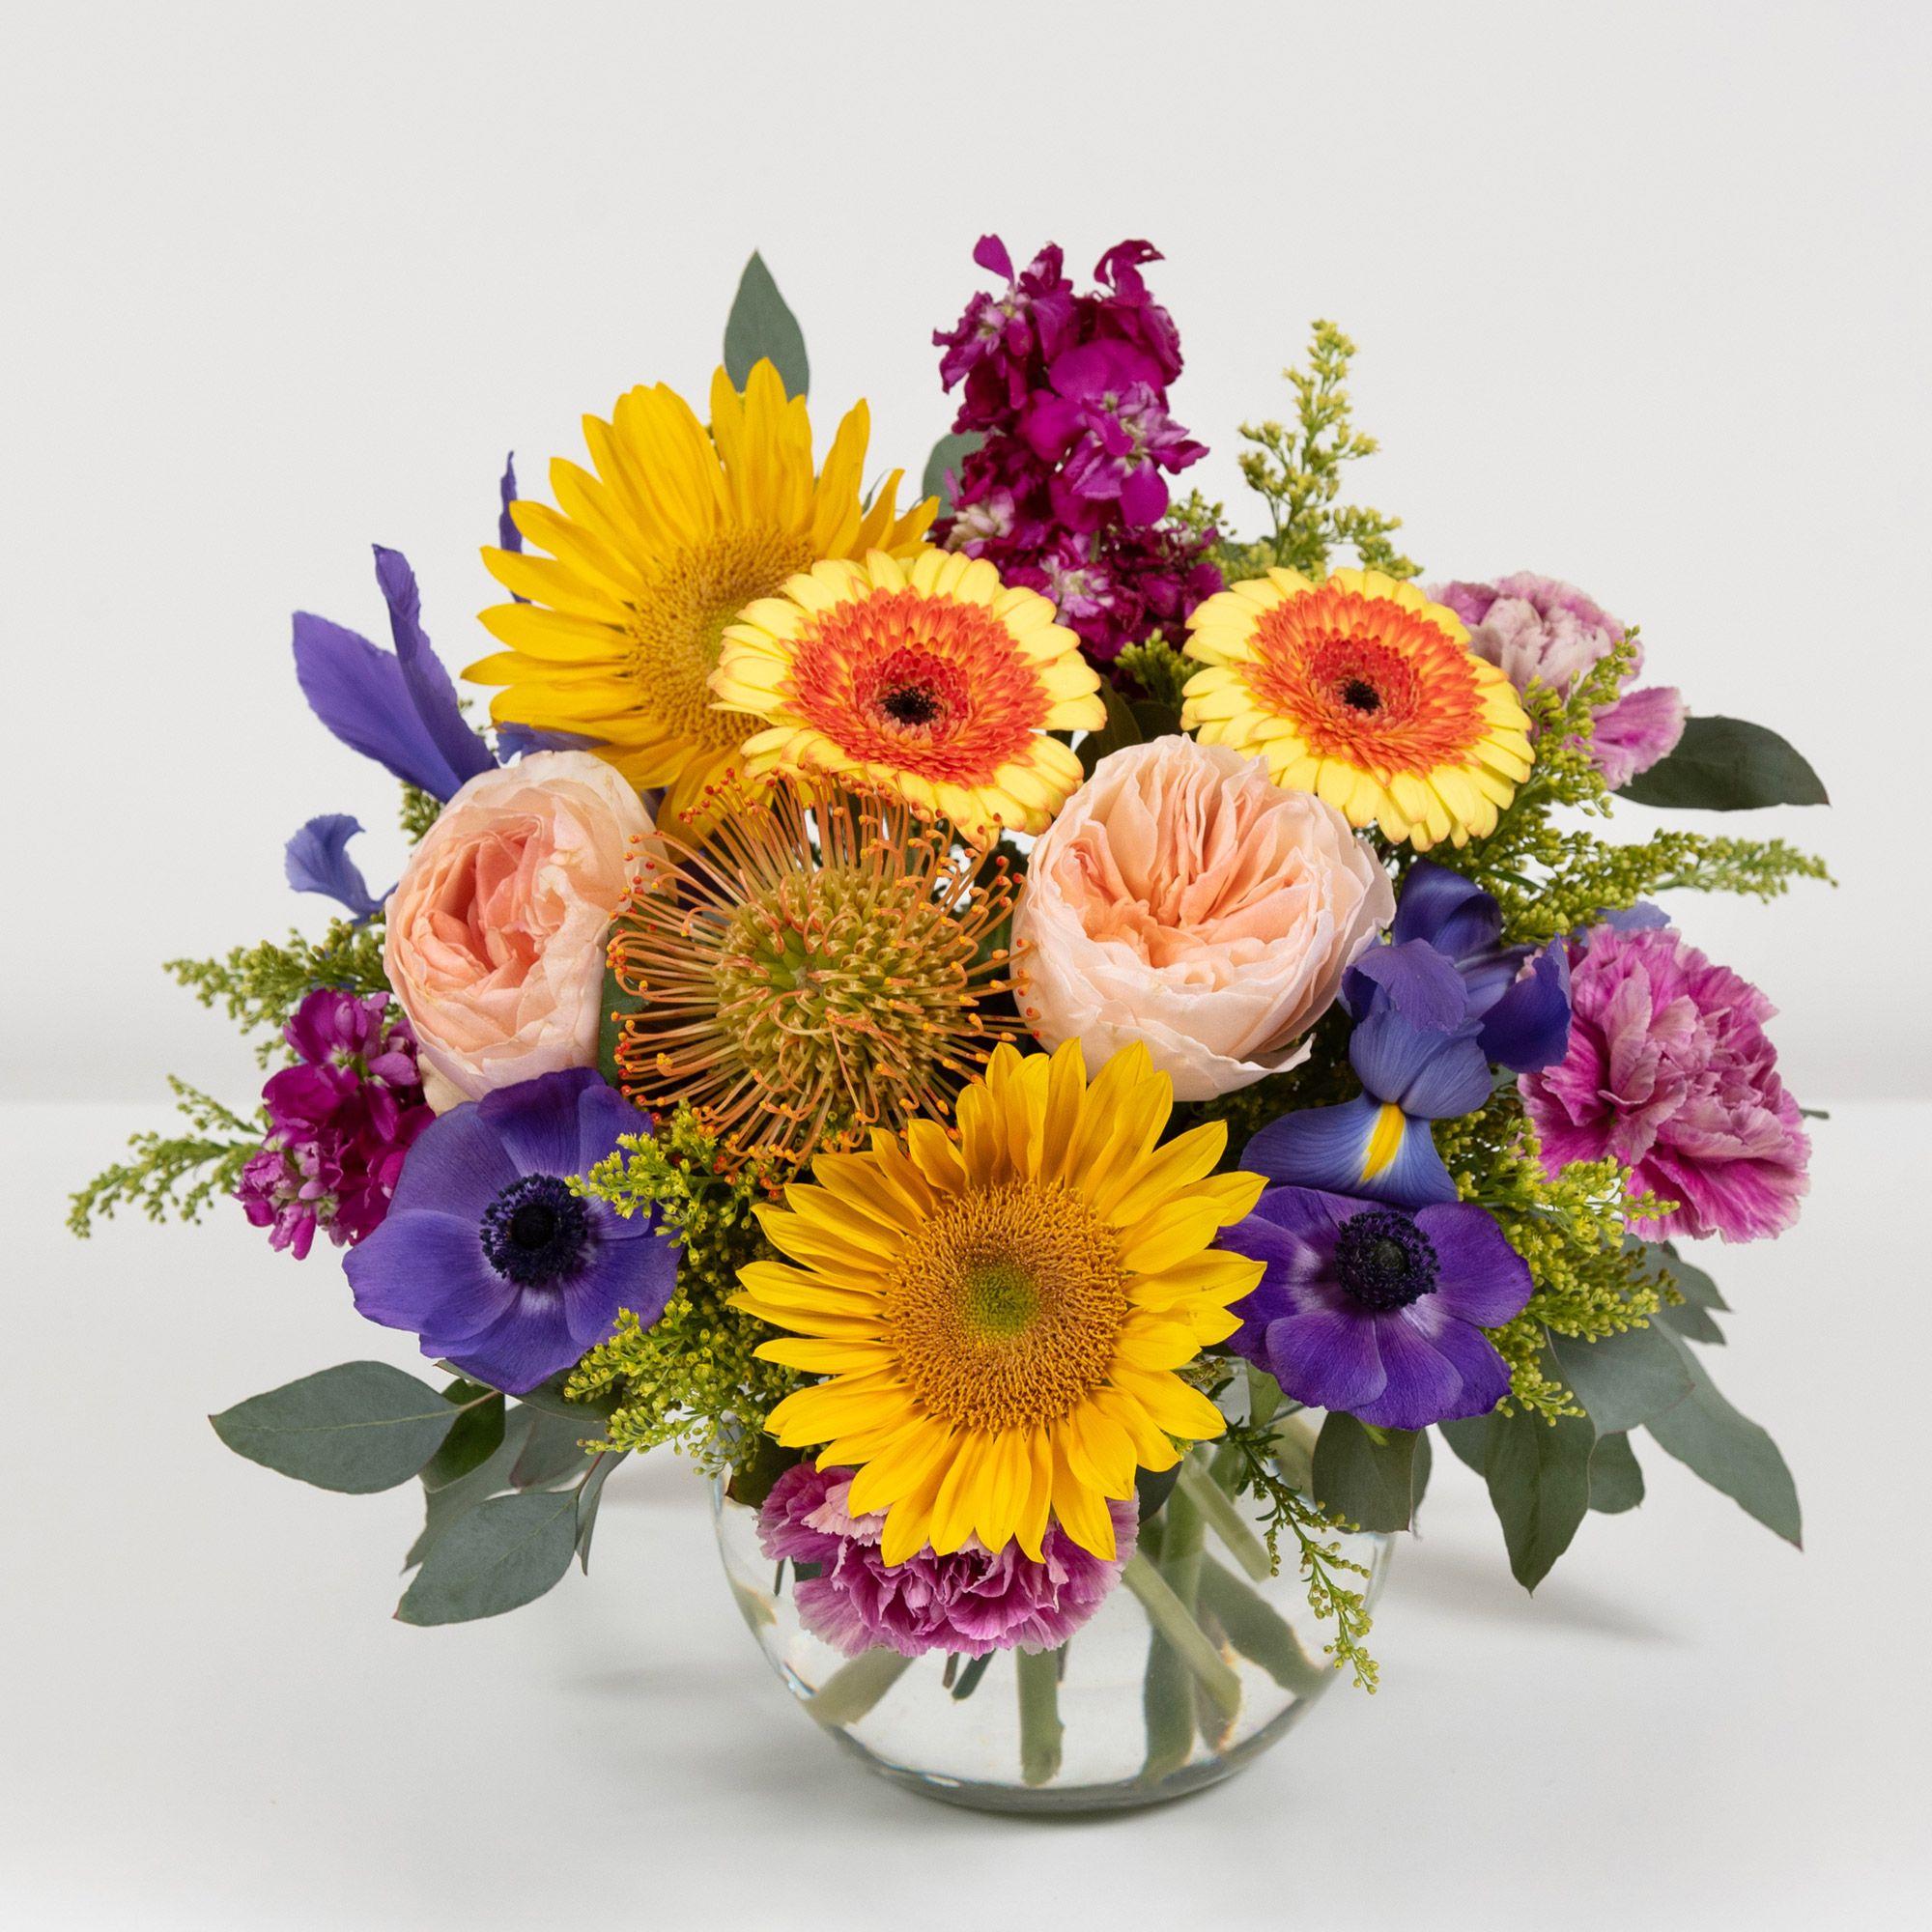 Burst Of Summer Wildwood Florist Petals Floral Design Local Flower Delivery Wildwood Nj 08260